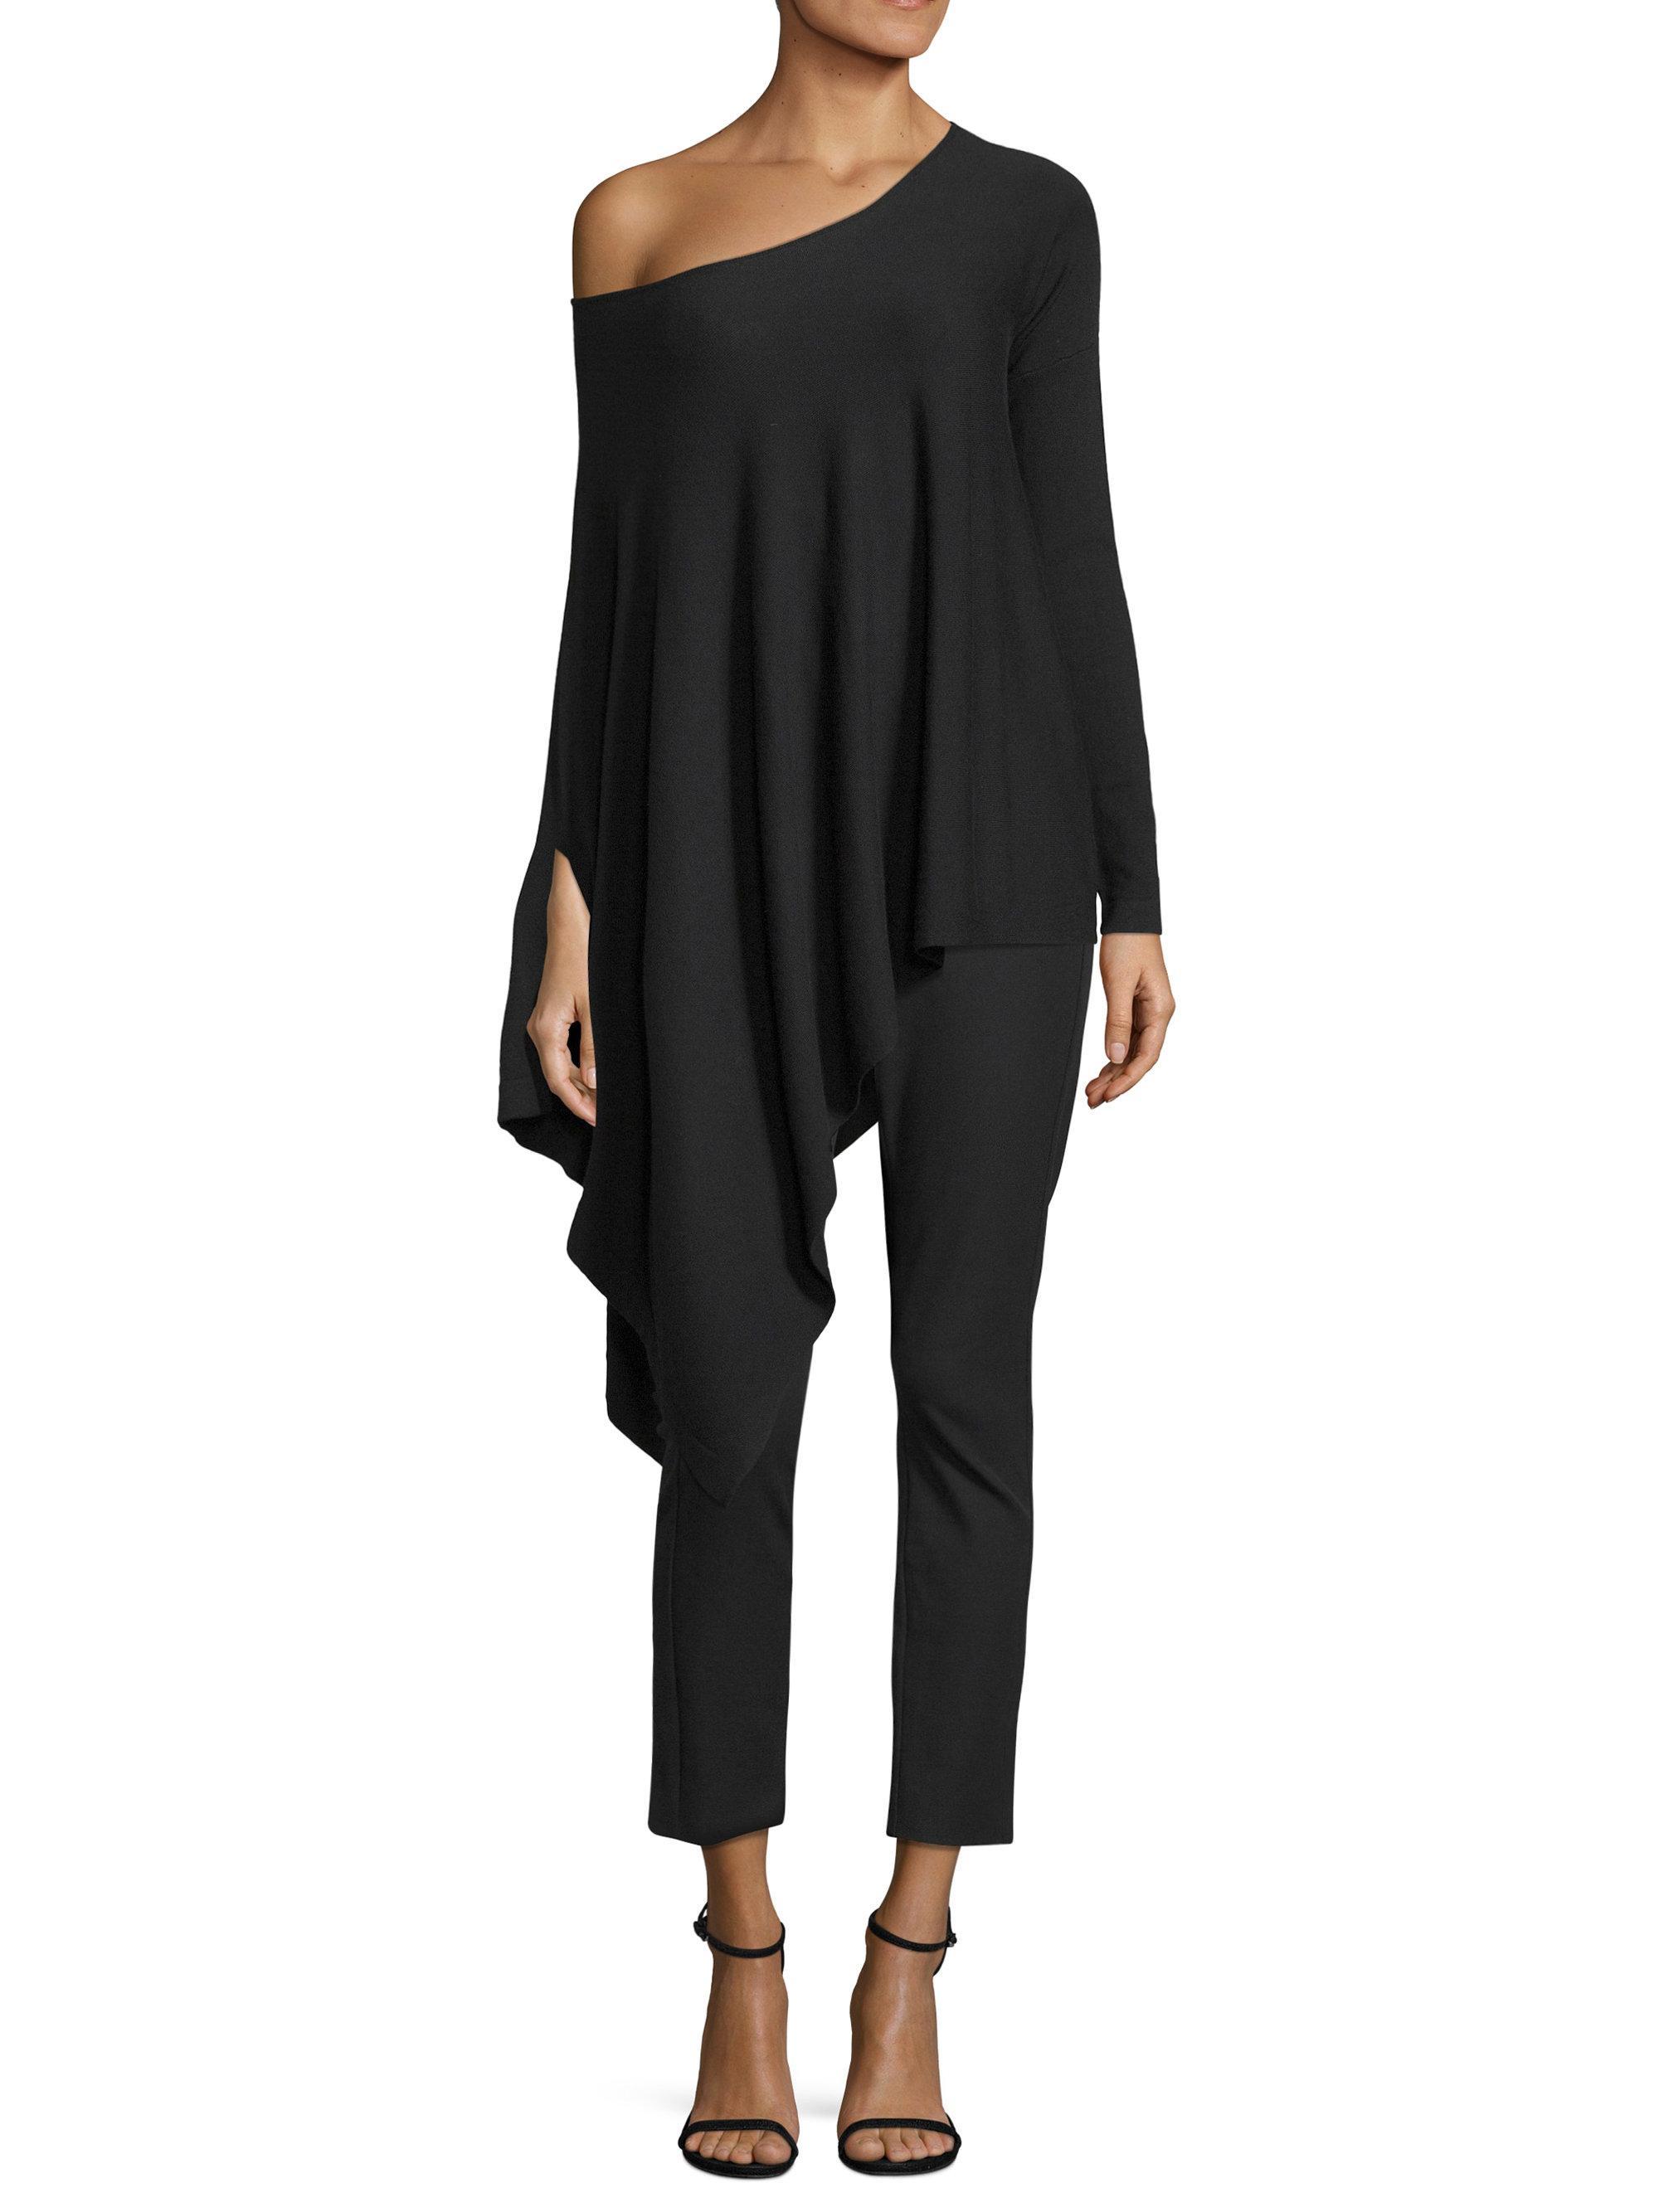 0c4446bc040ef4 Lyst - Donna Karan Asymmetrical Pullover in Black